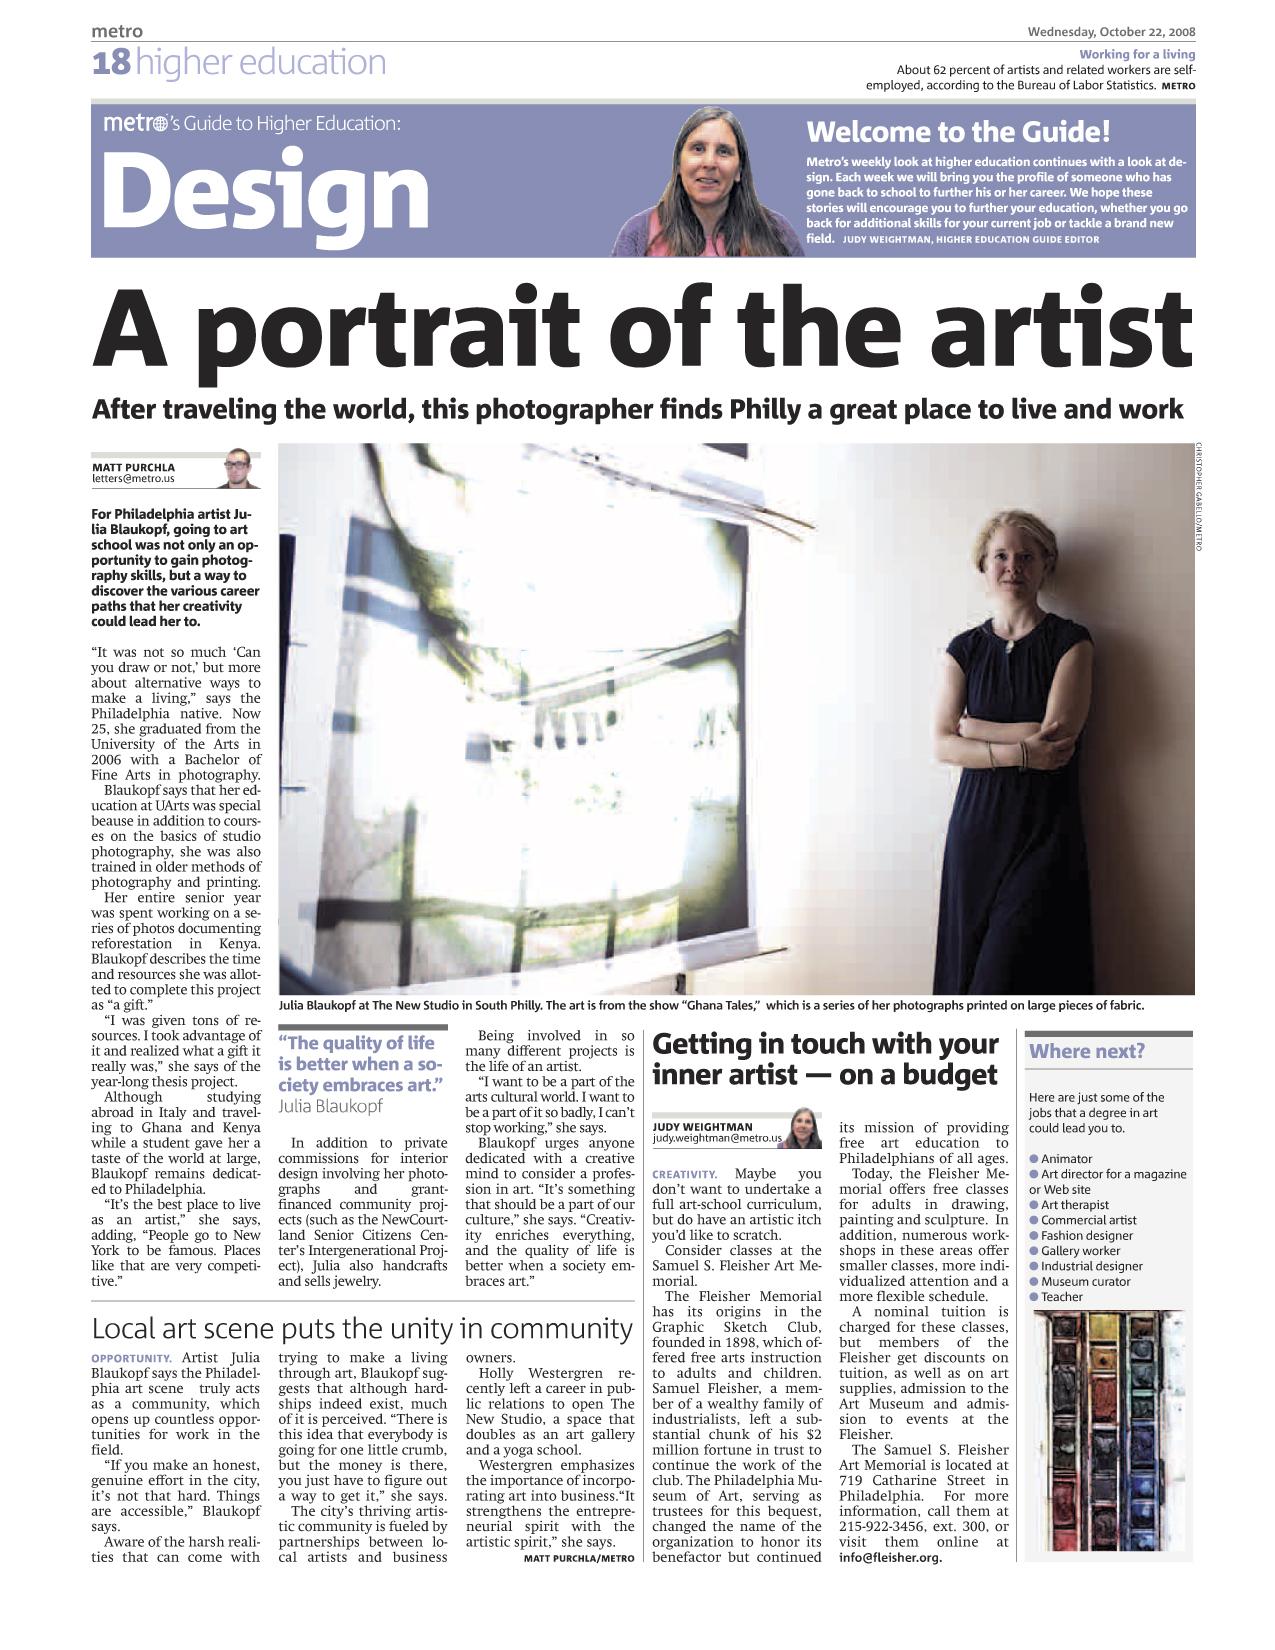 Metro Article.jpg